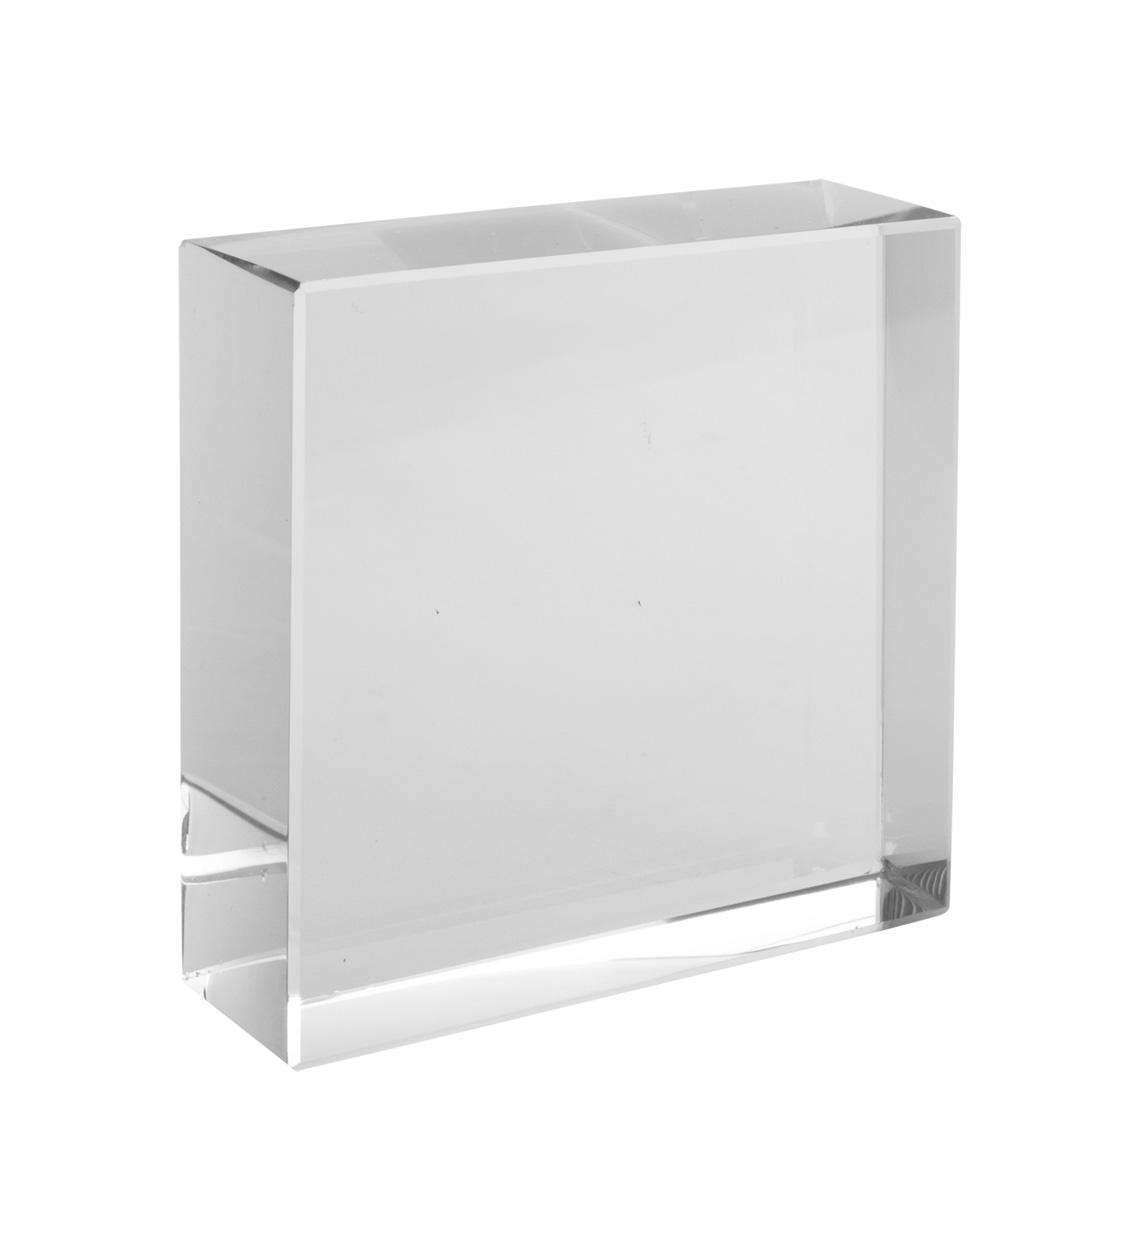 Daytona glass block